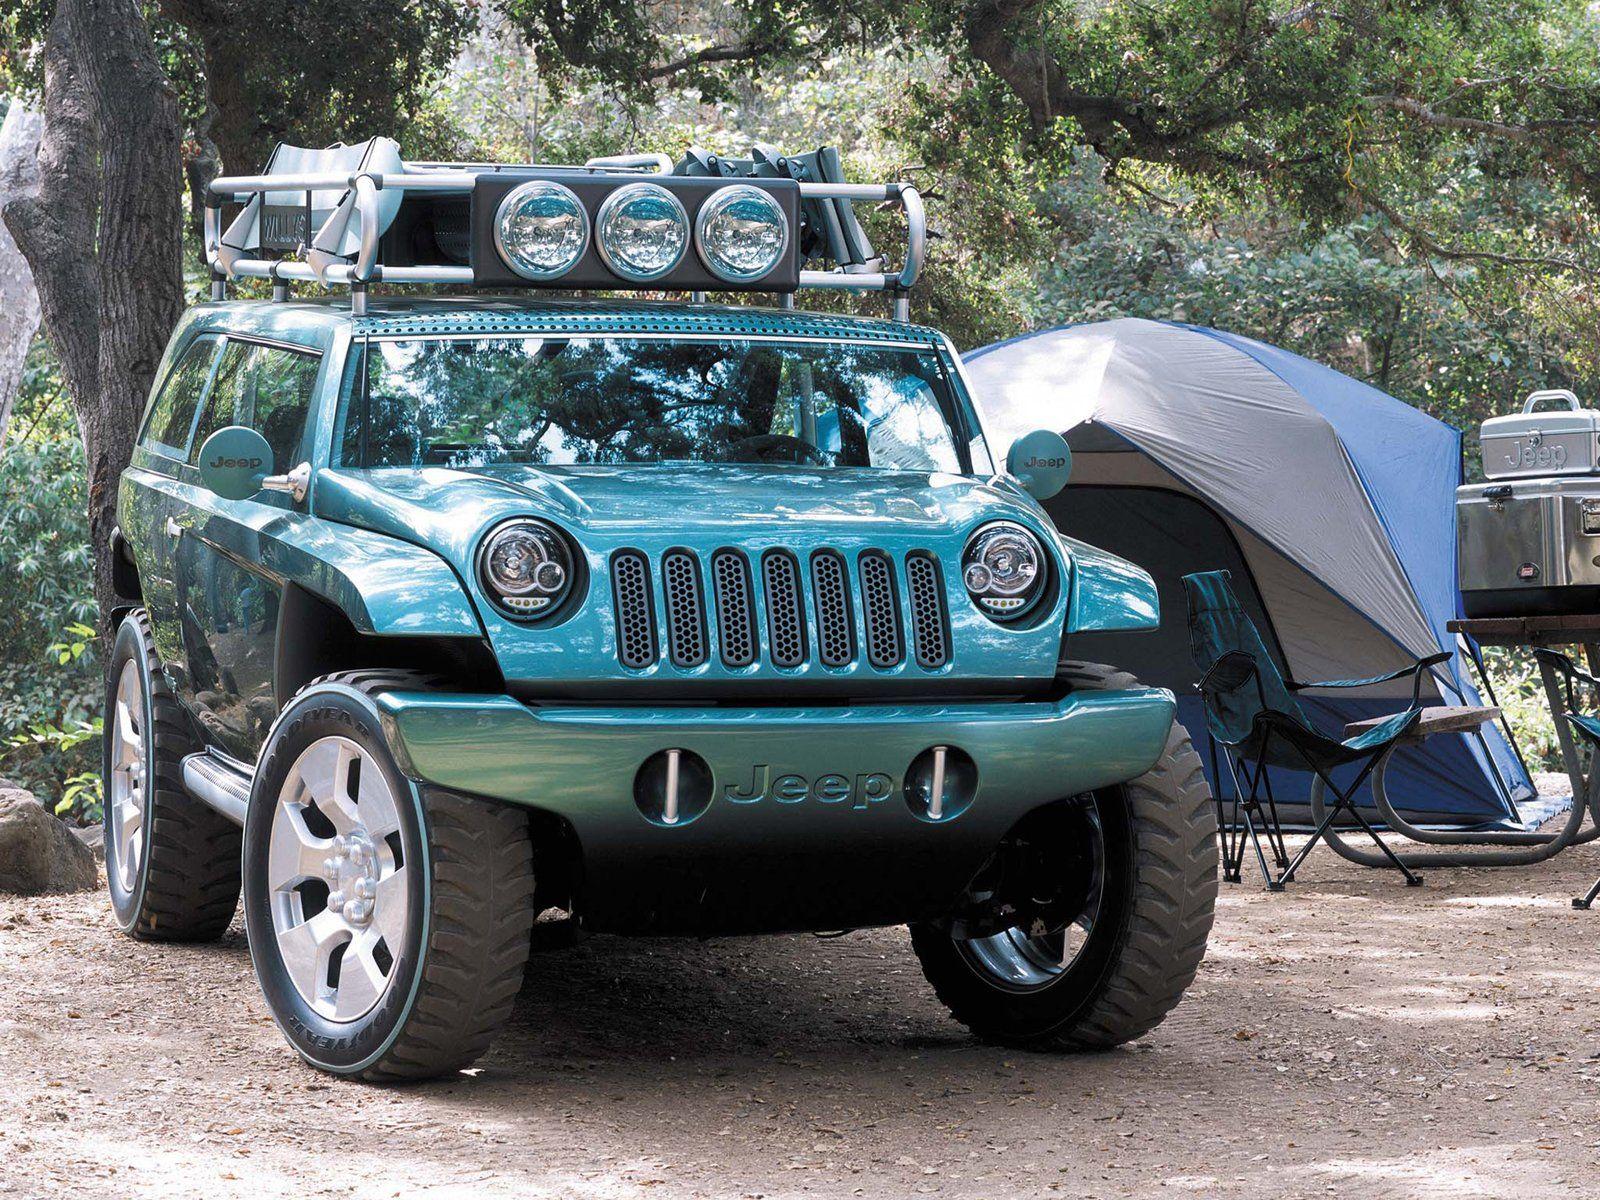 2001 Jeep Willys 2 Concept 4x4 Fs Wallpaper 1600x1200 287469 Wallpaperup Willys Jeep Jeep Concept Offroad Jeep